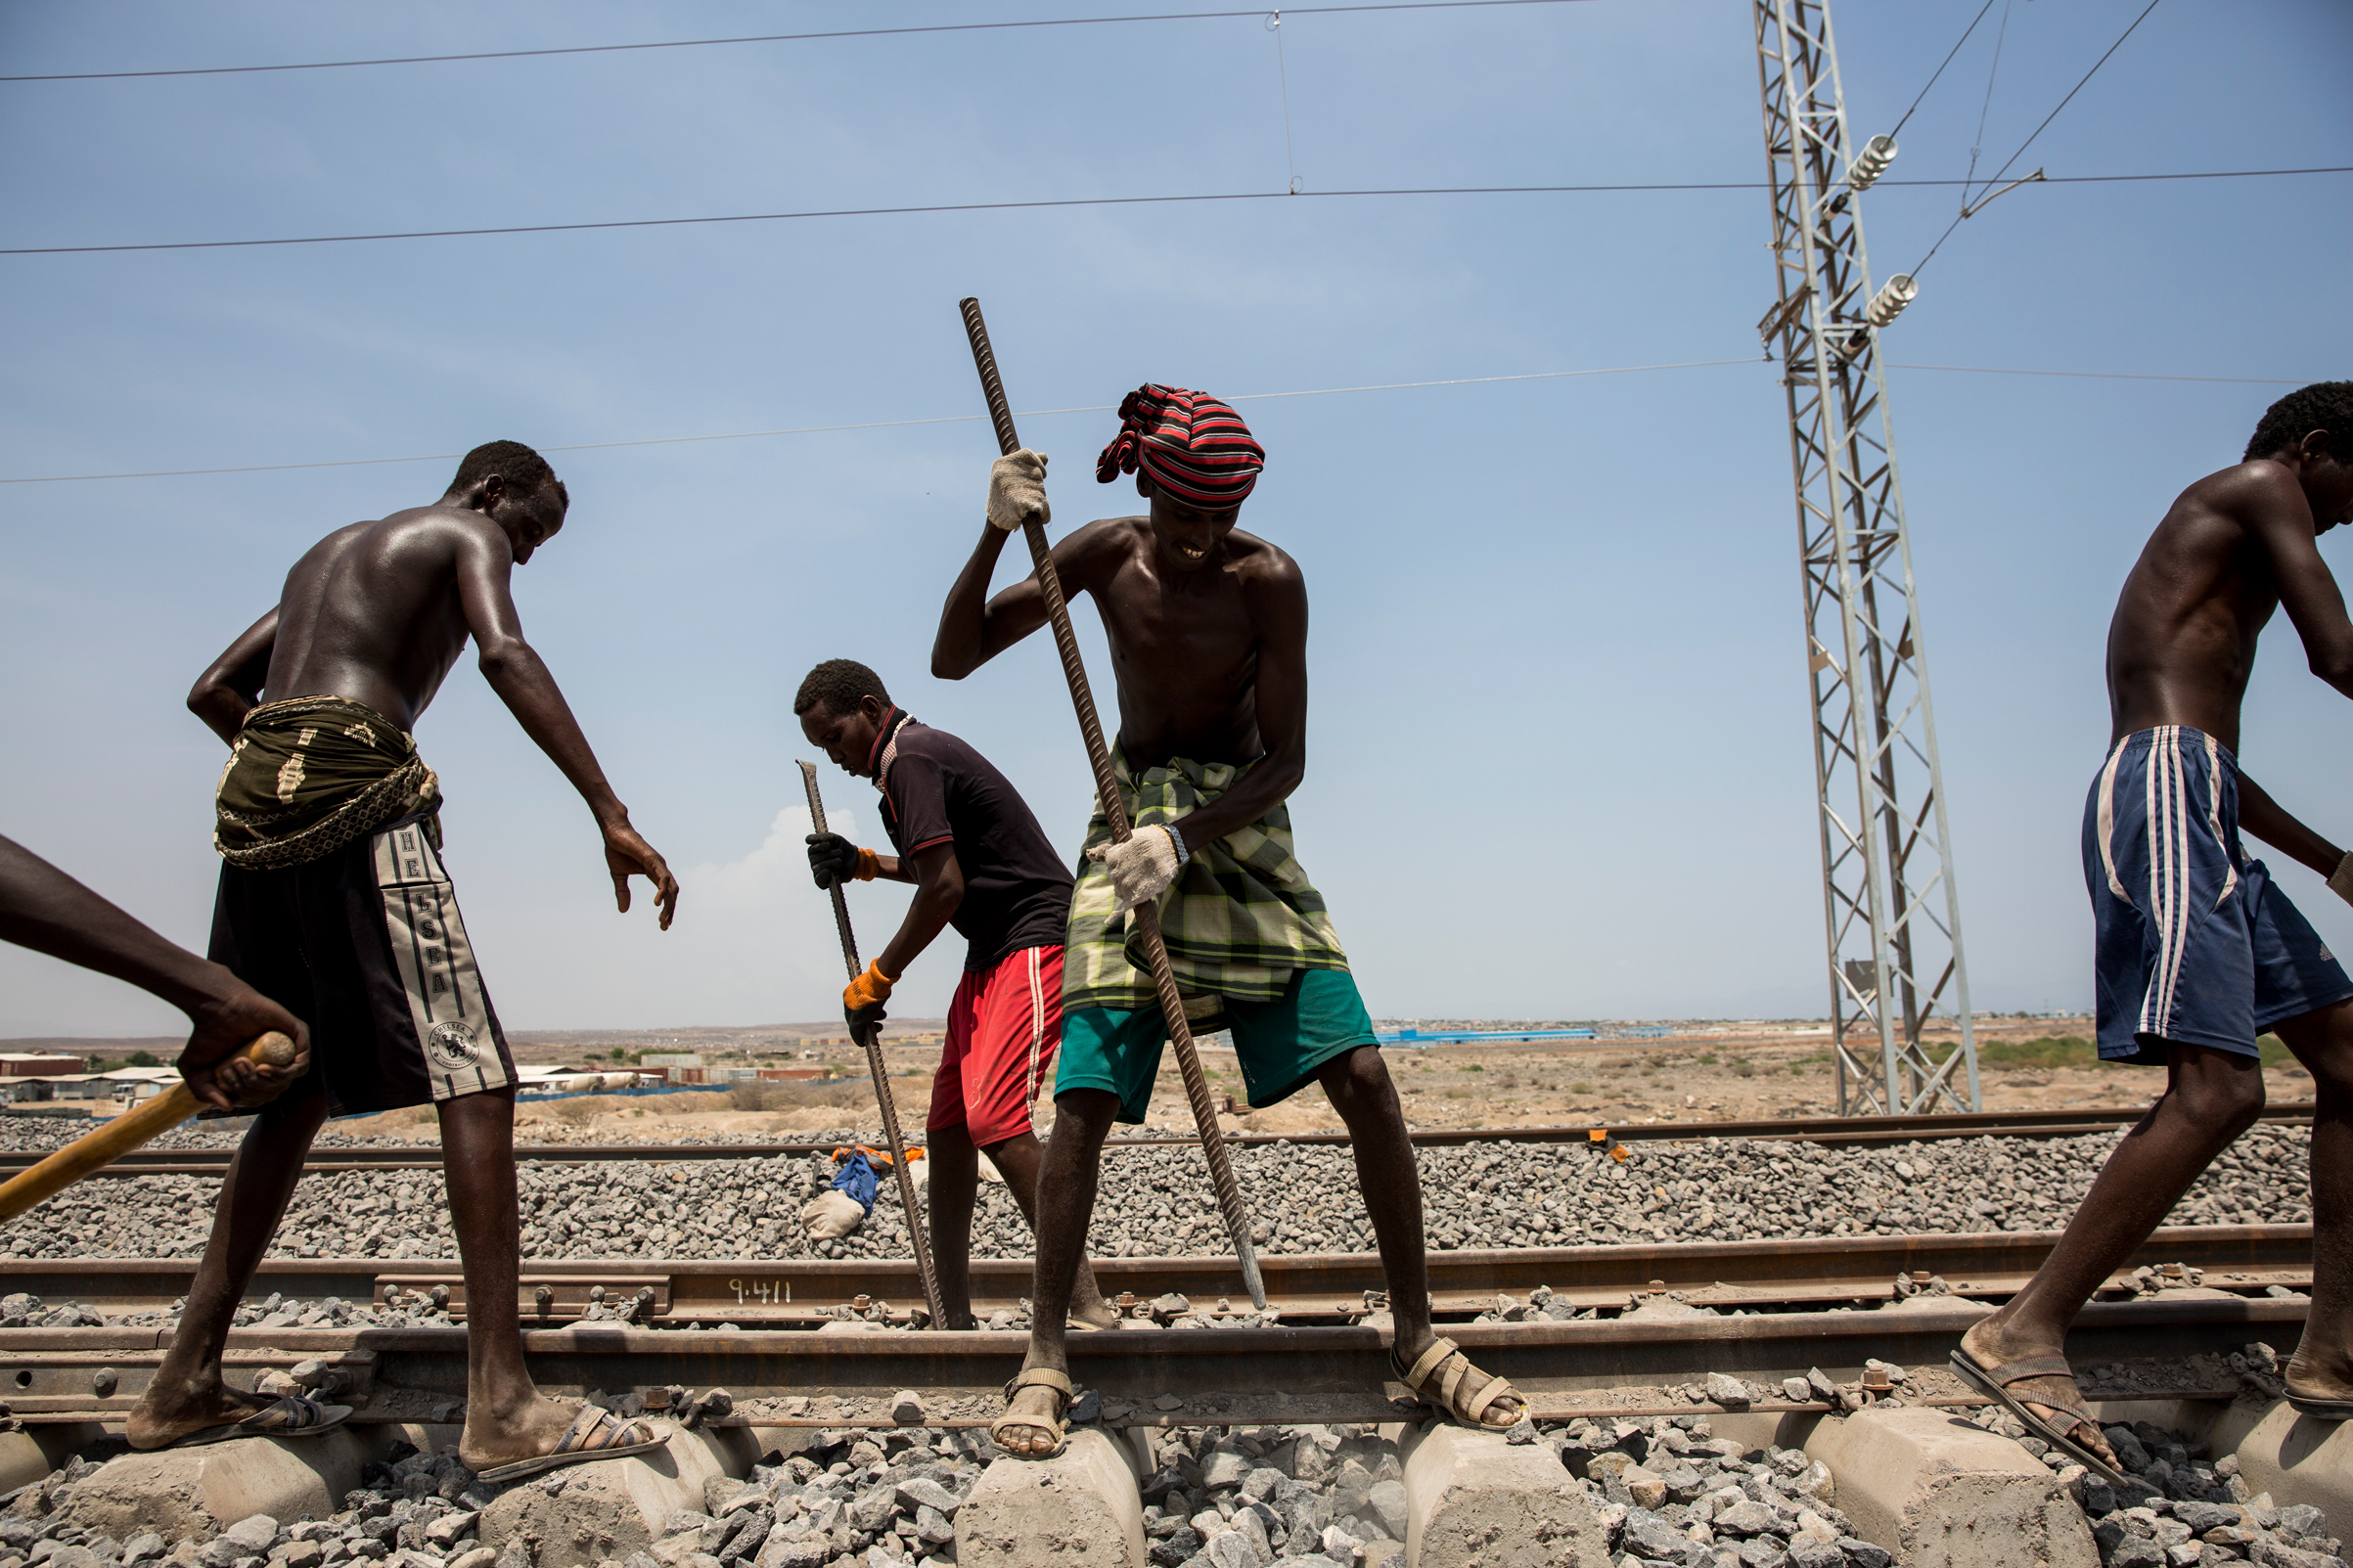 bethiopia djibouti china high speed rail